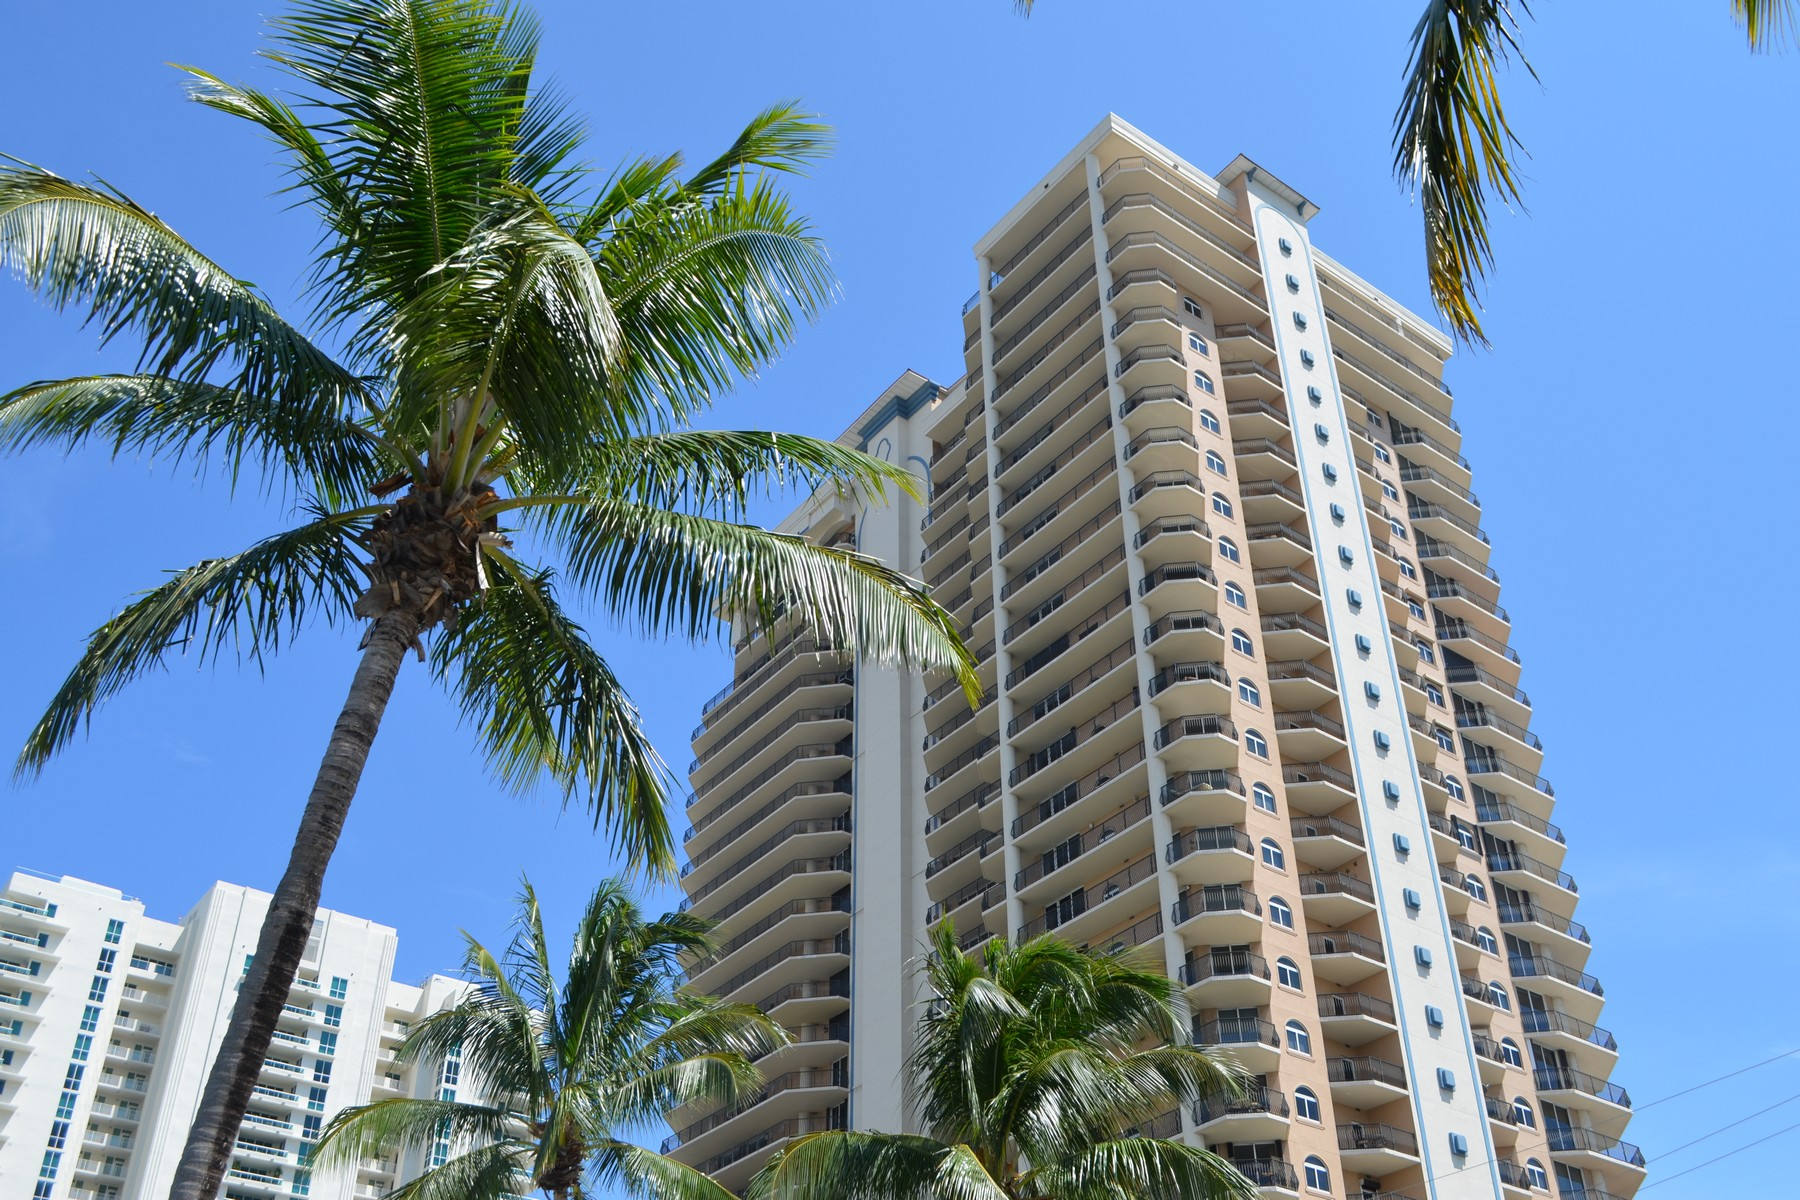 Condomínio para Venda às Jackson Tower 100 S Birch Rd #2501A Fort Lauderdale, Florida 33316 Estados Unidos